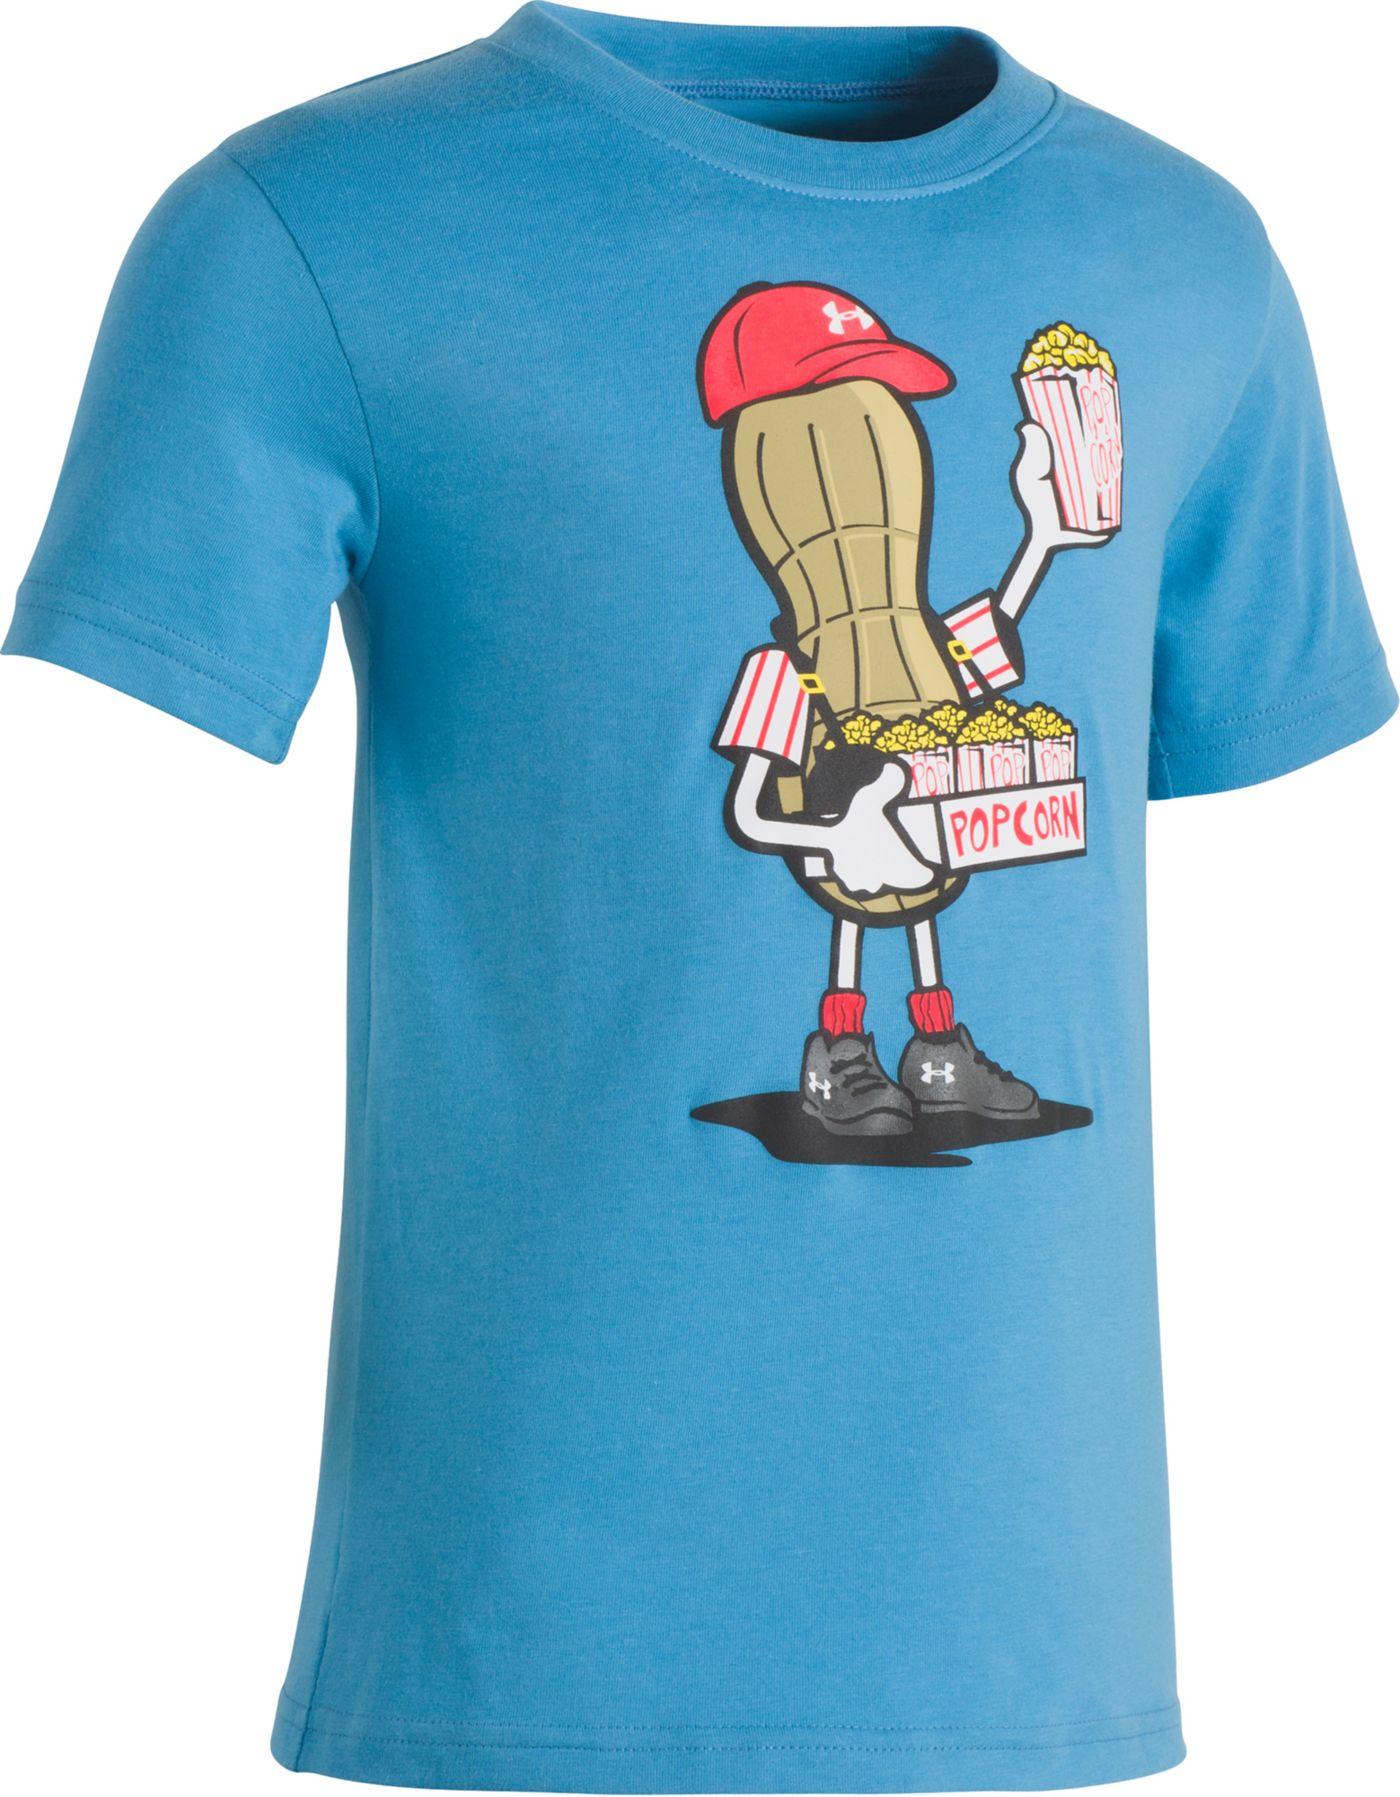 Under Armour Little Boys' Popcorn Peanut Graphic T-Shirt